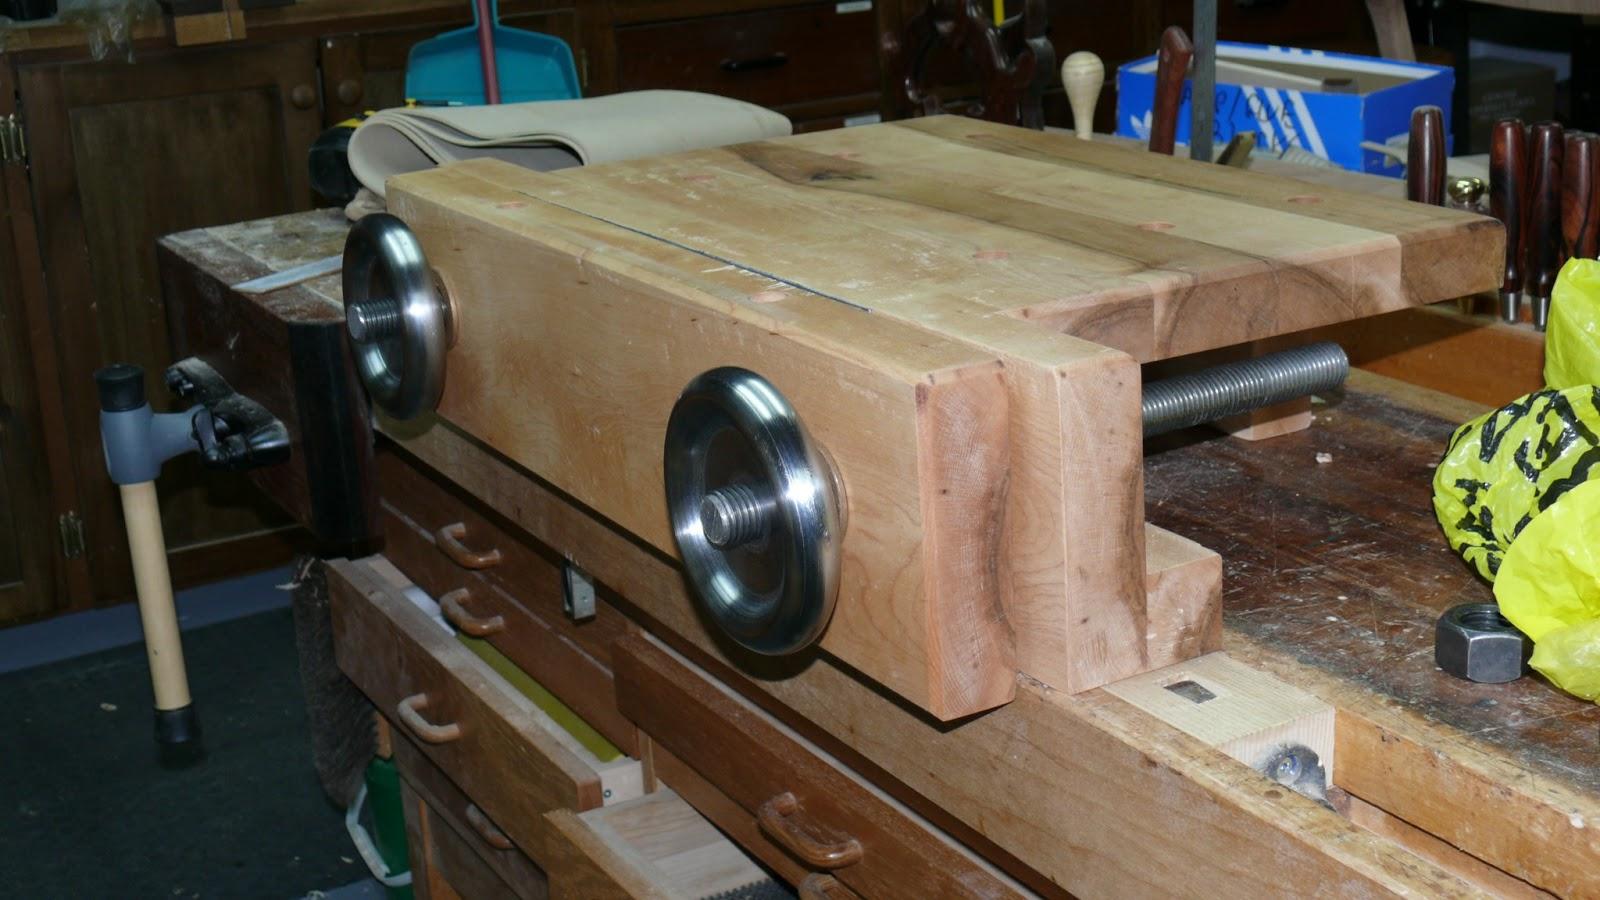 Rich S Woodcraft Hand Tool Bench On Bench Aka Moxon Vise